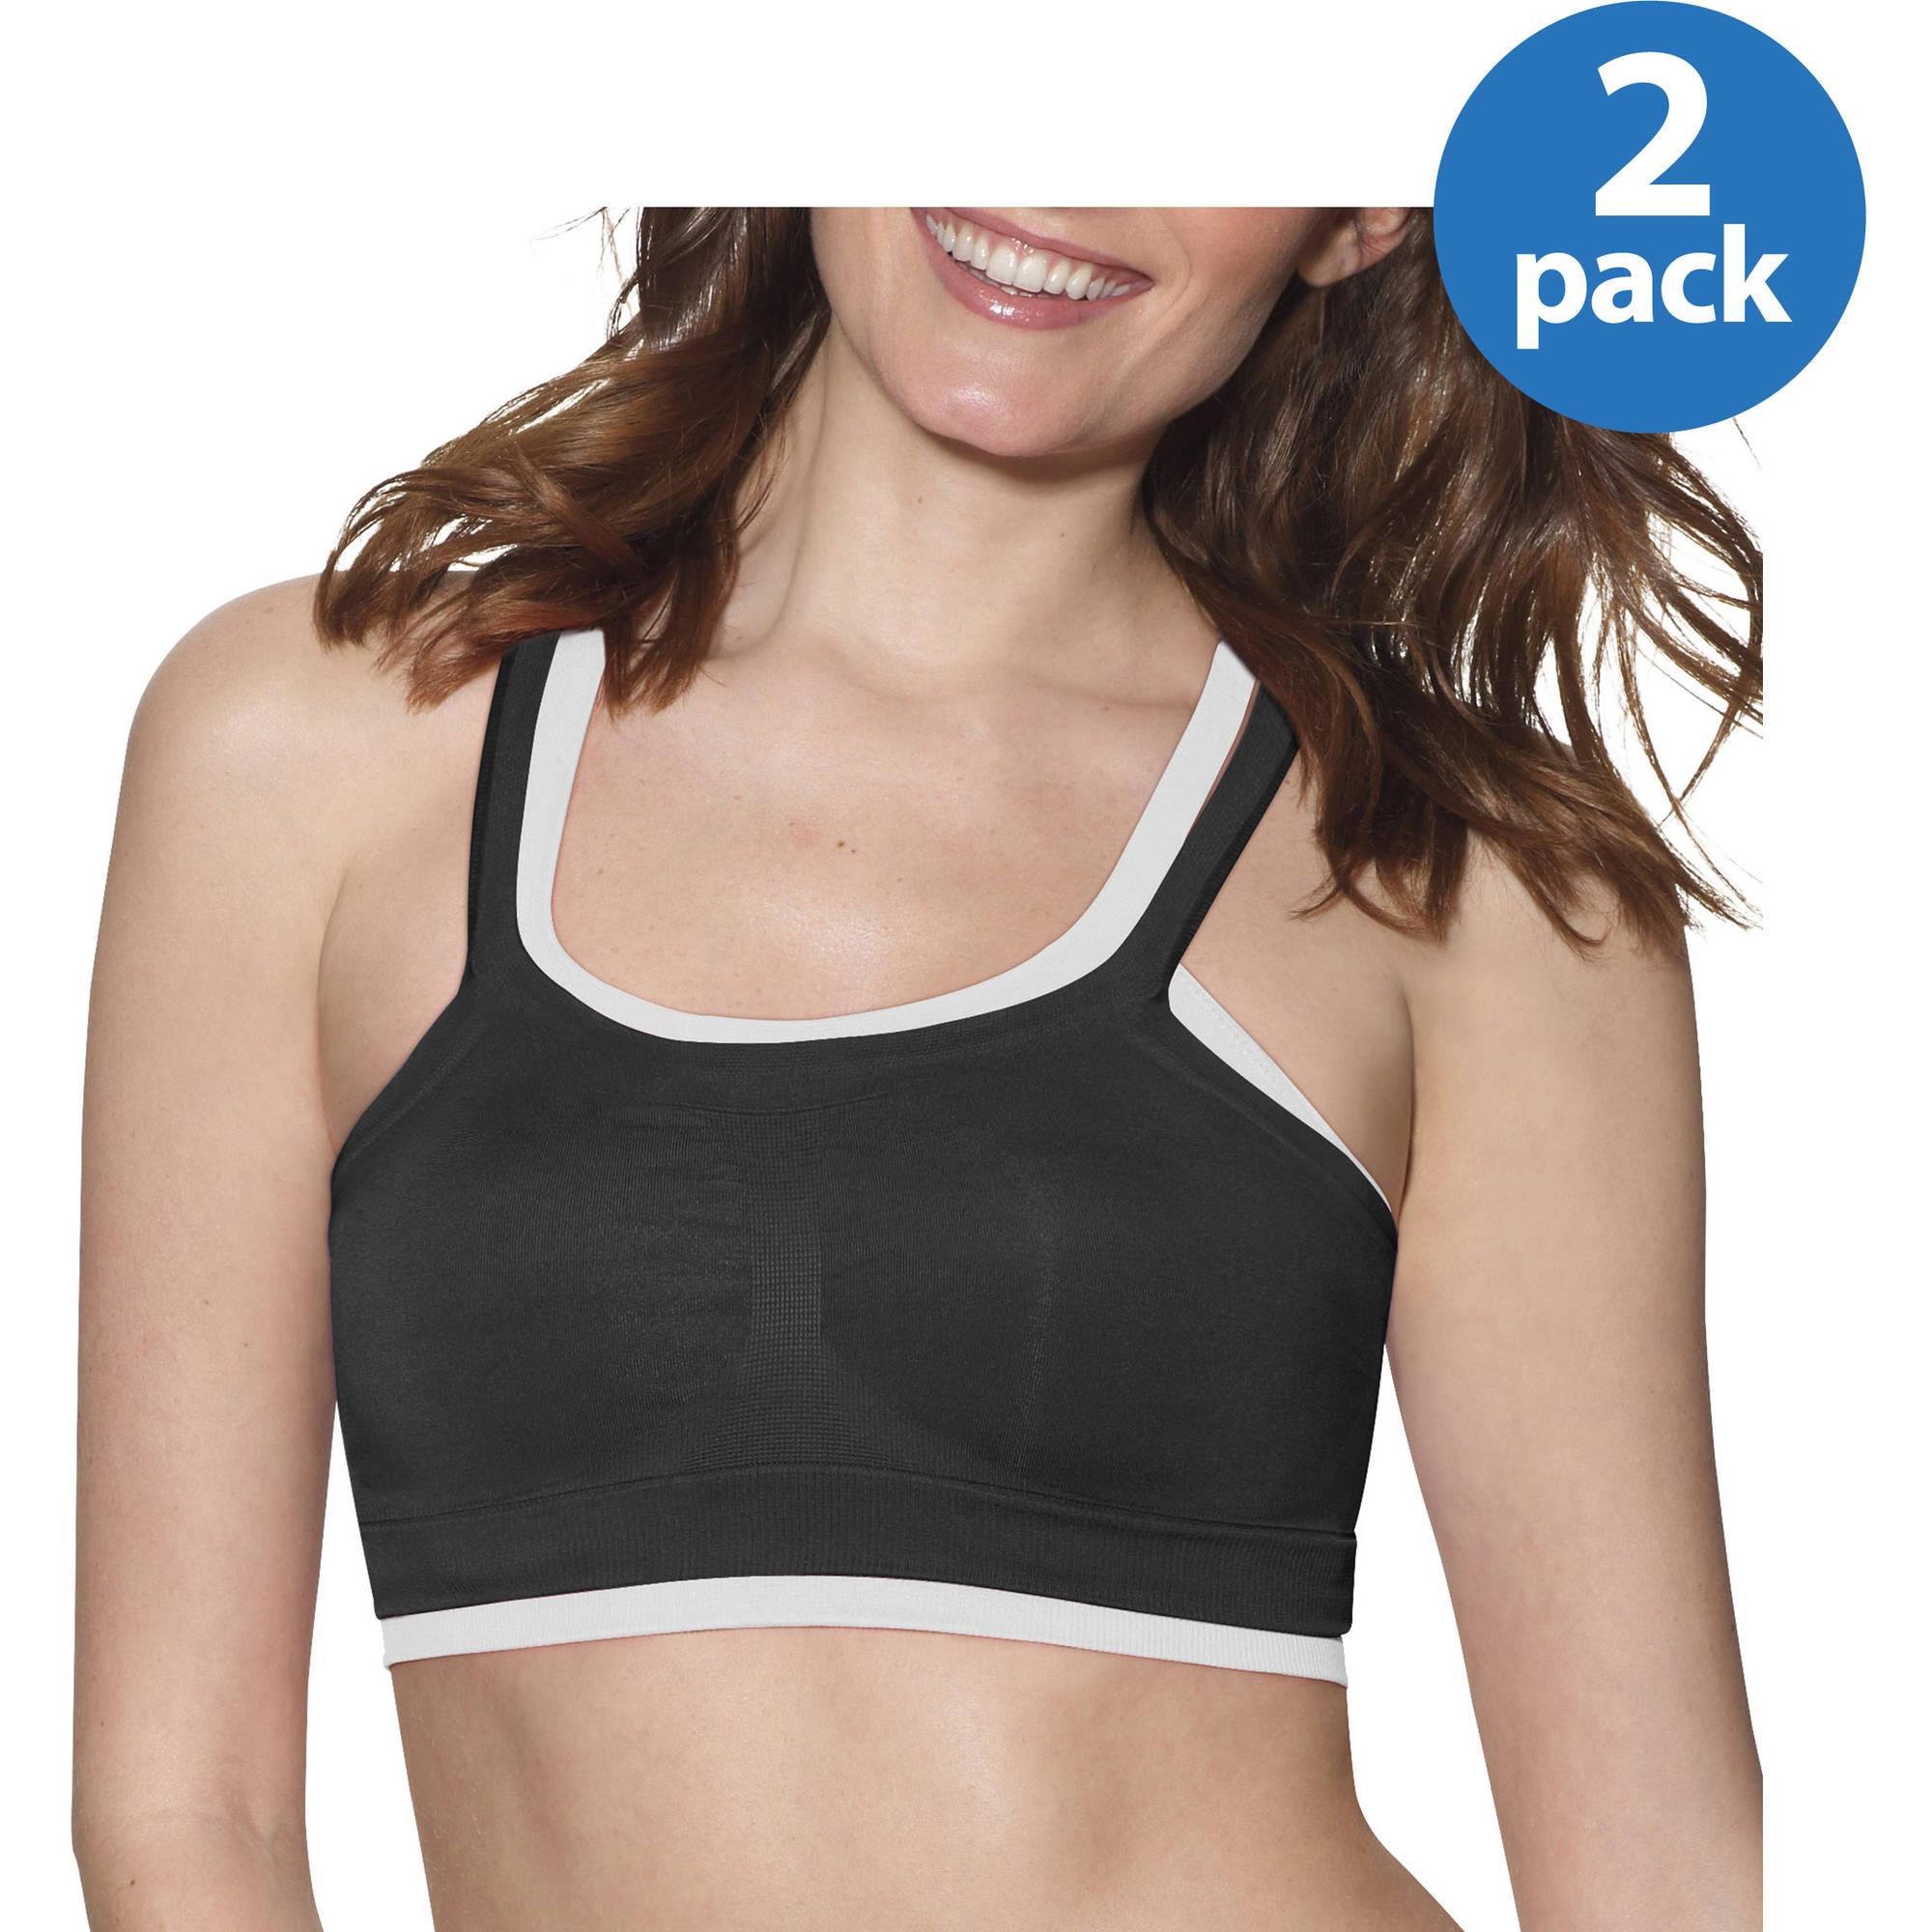 corsetry comfort bra comfortflex p hanes hns flex comforter white detail fit wirefree